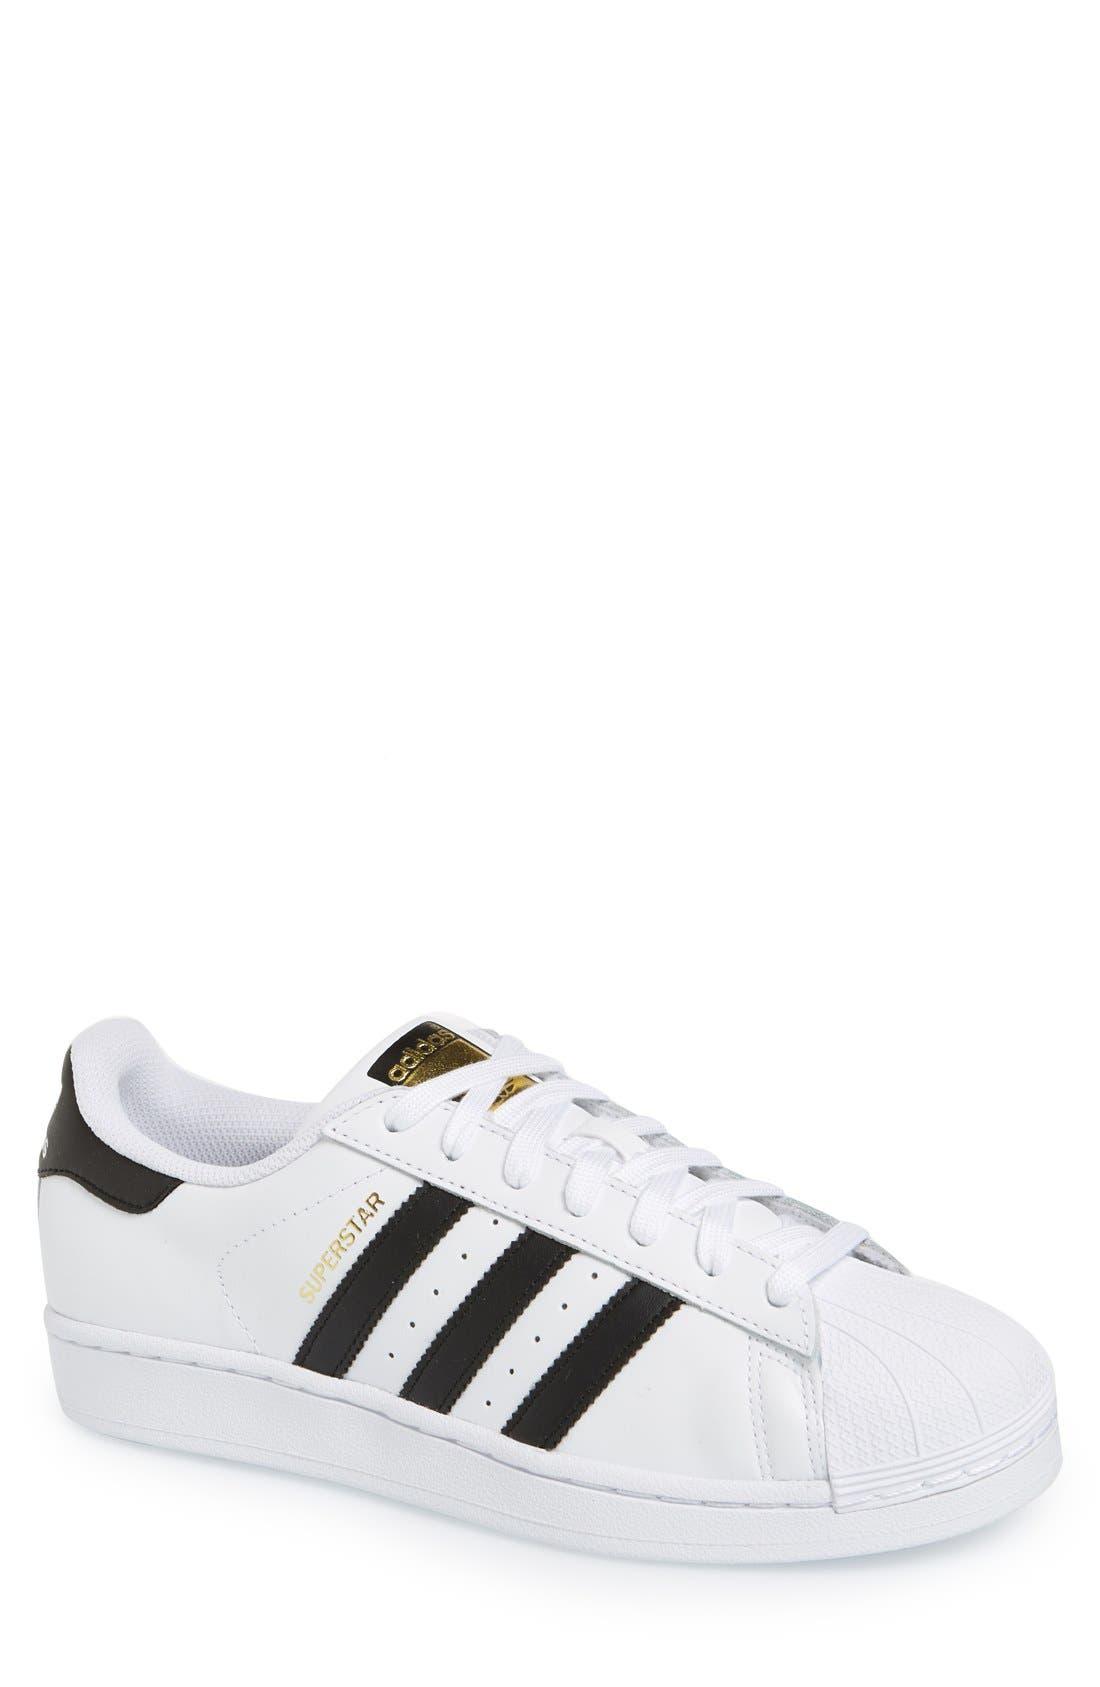 Main Image - adidas Superstar Foundation Sneaker